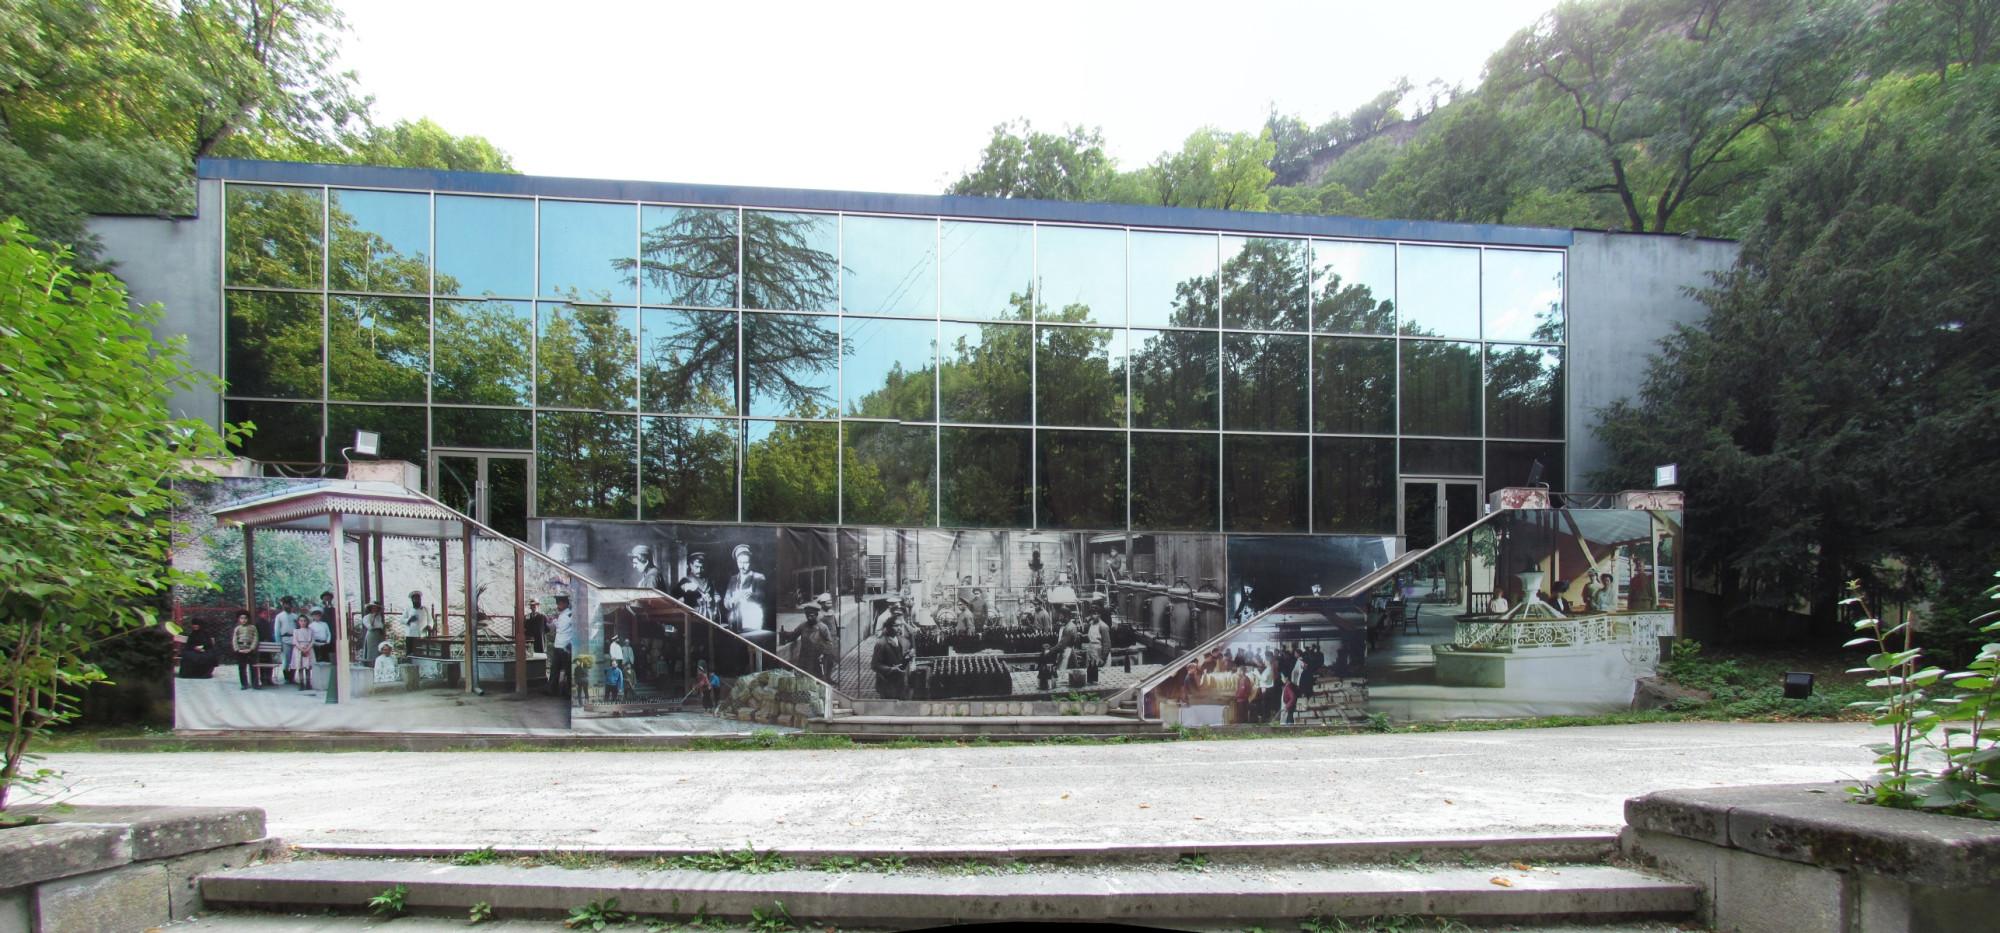 2015 Borjomi - Park - Mineral water factory